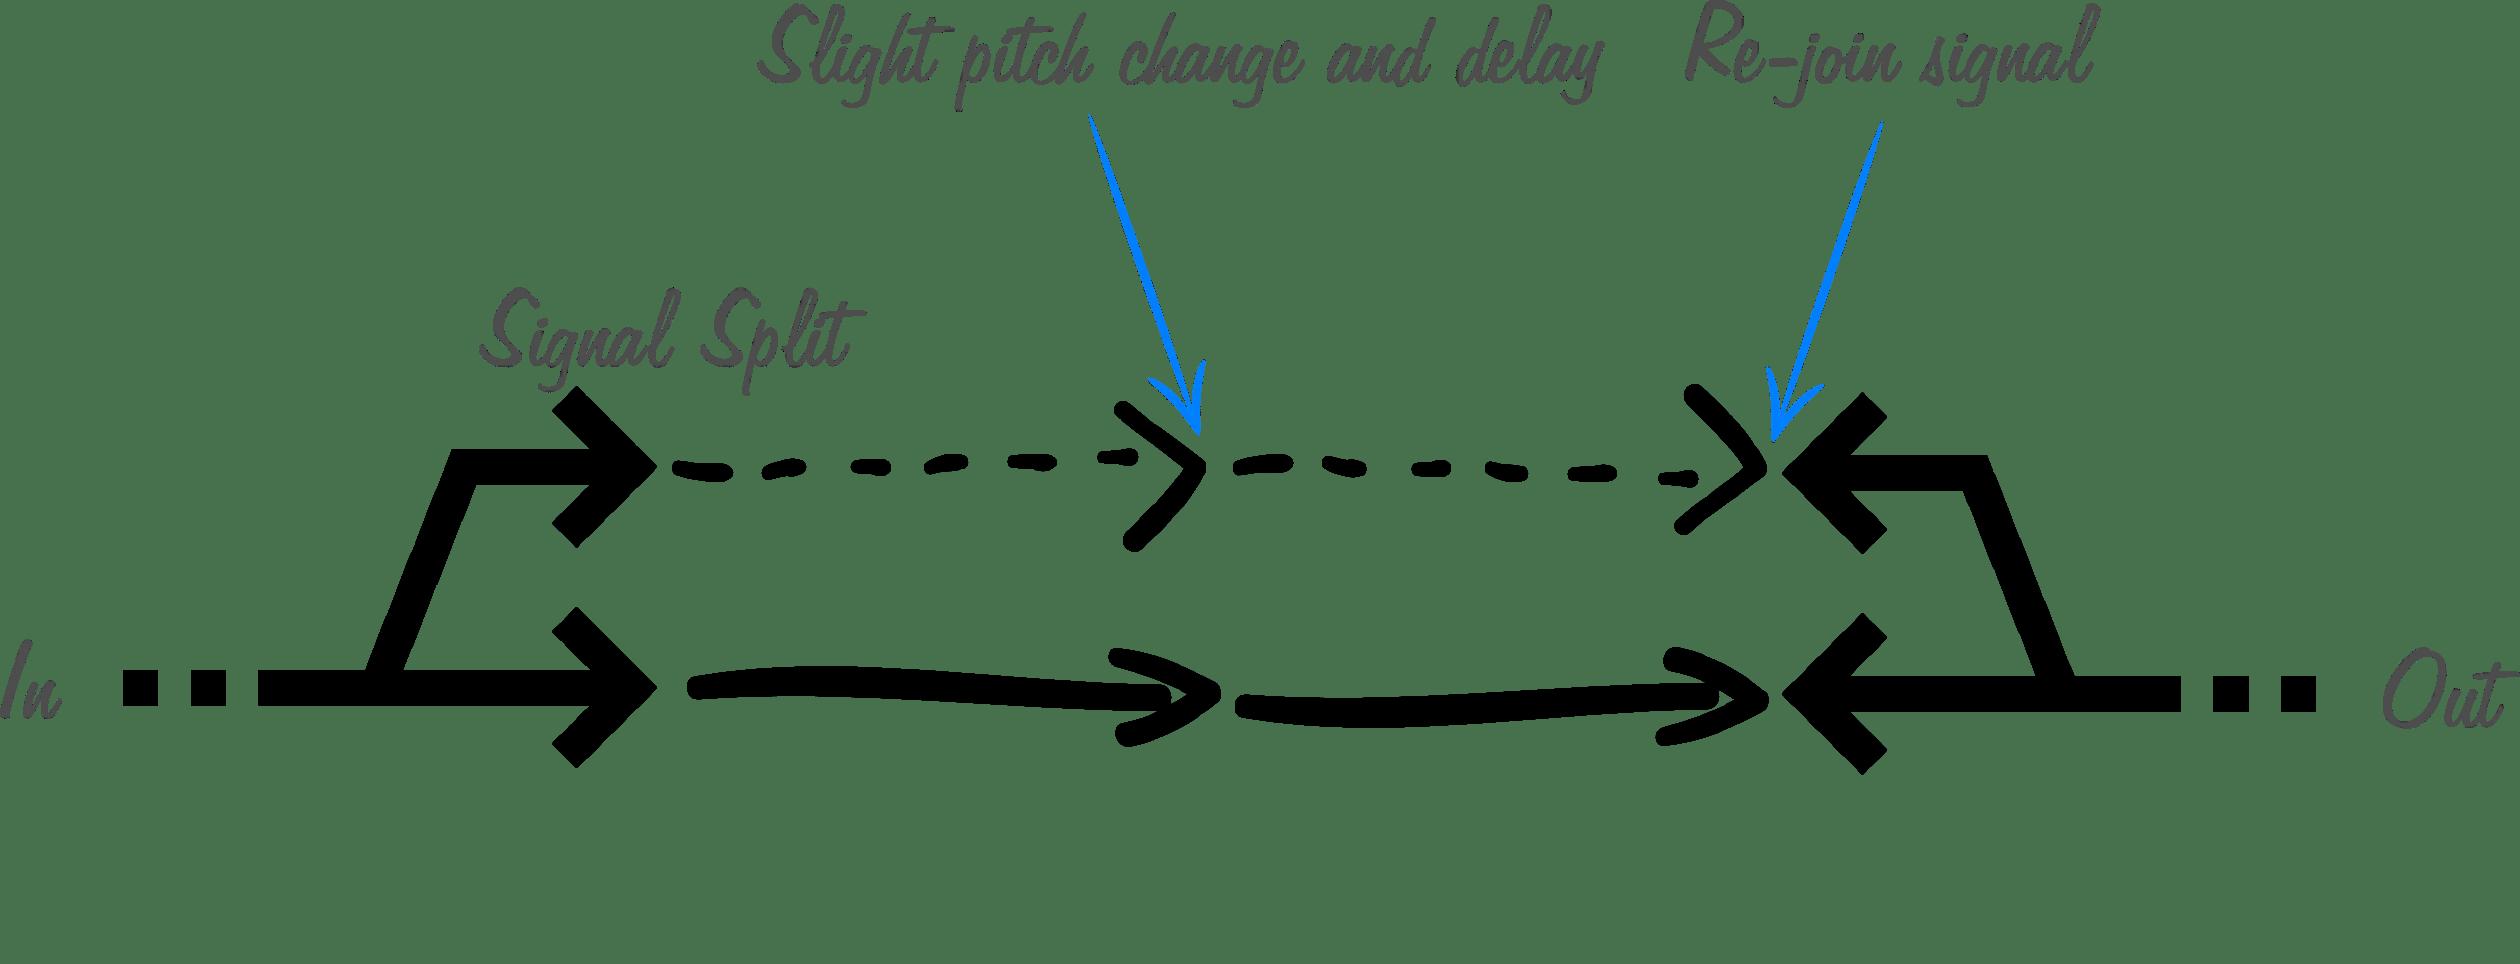 Understanding Modulation In An Electric Guitar Rig